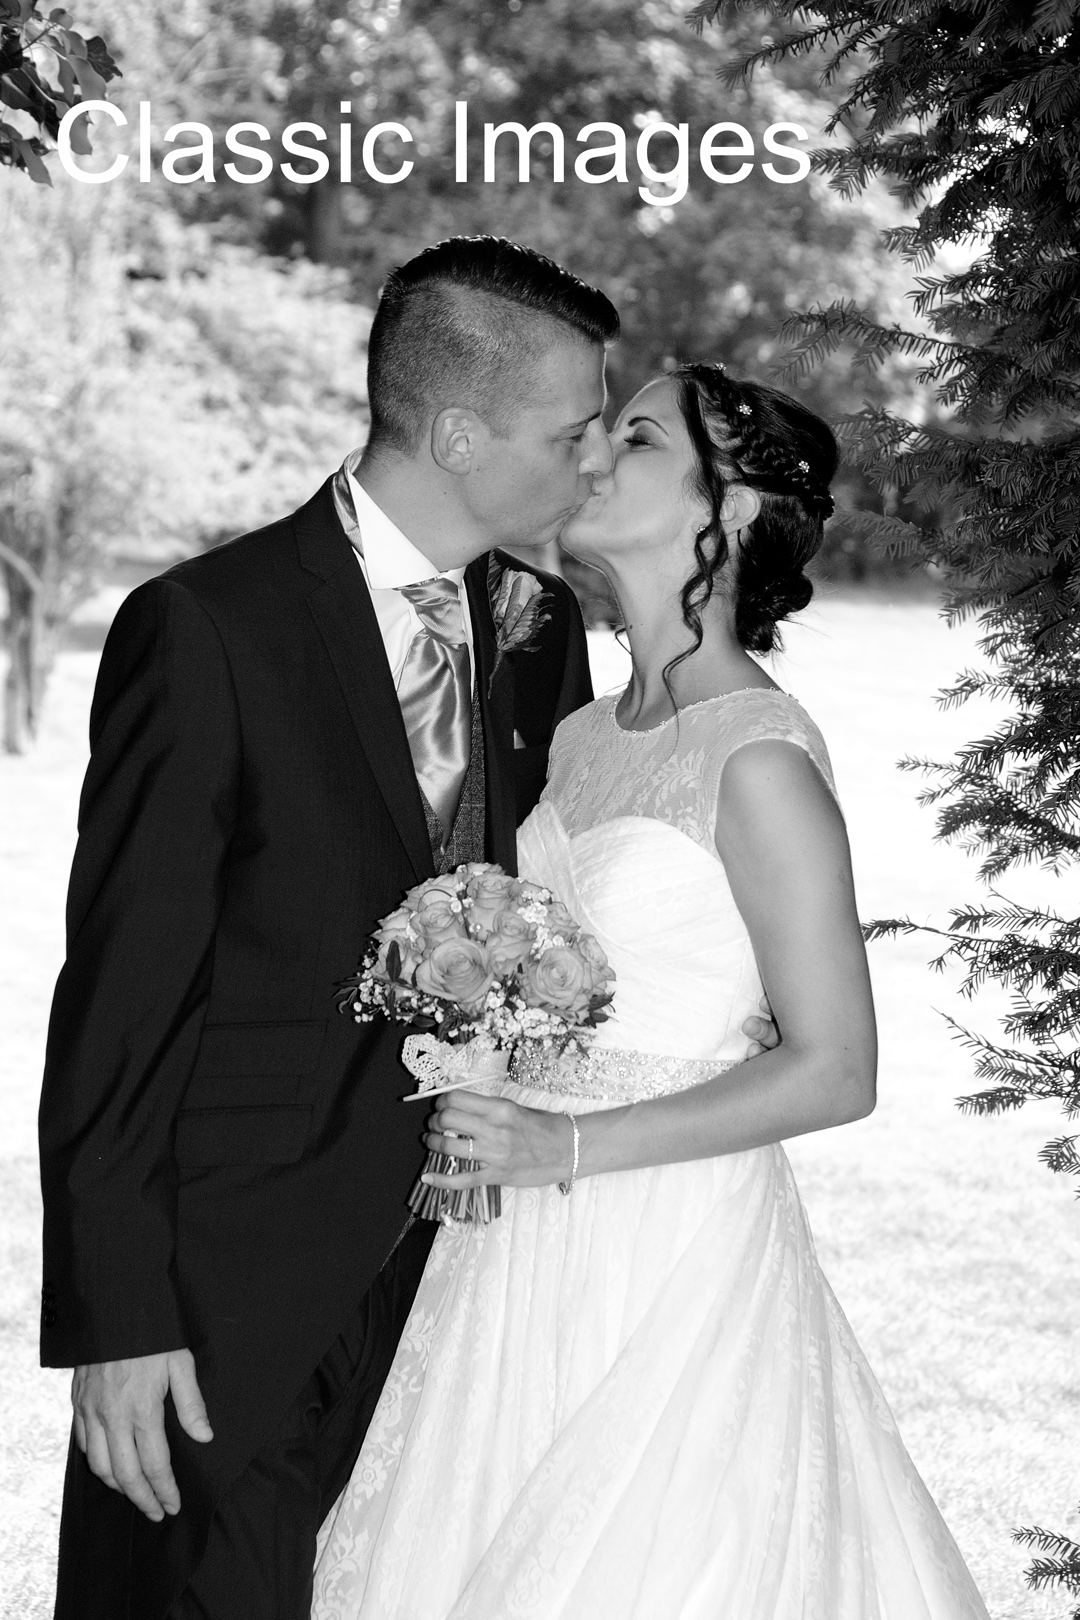 bride-groom-kissing-wedding-photo